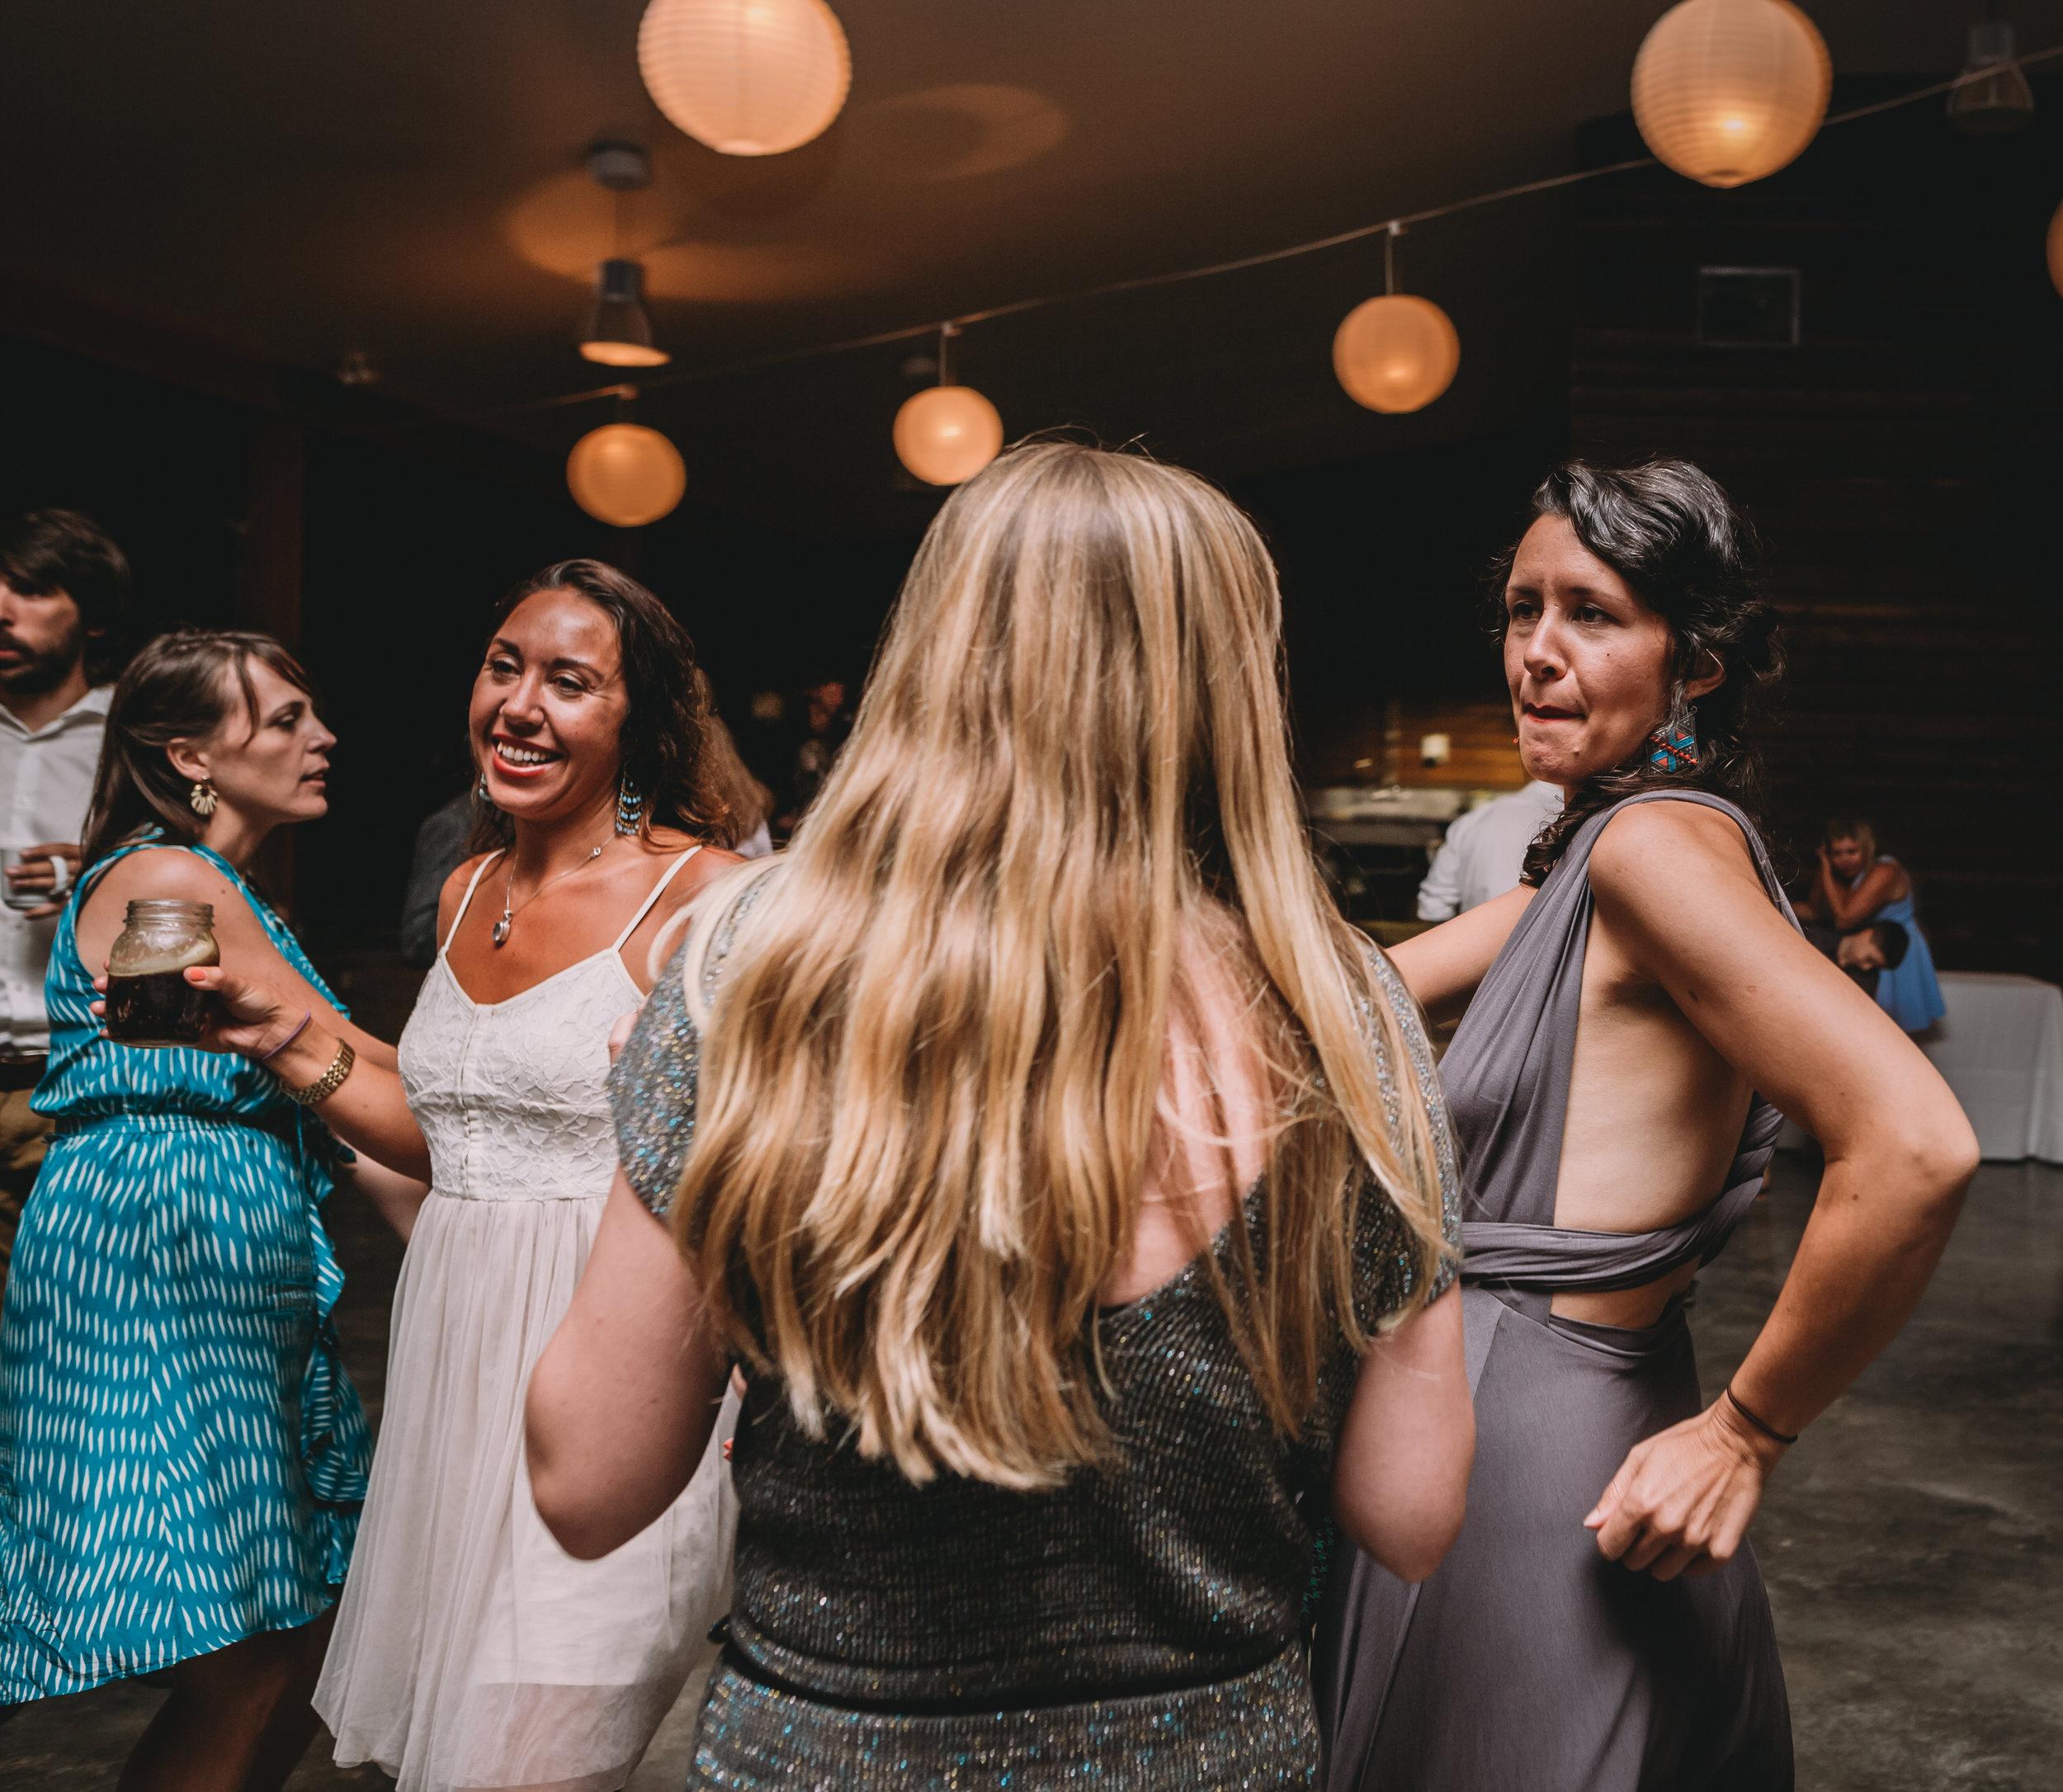 Camp Fircom Wedding - Vancouver Wedding Photographer & Videographer - Sunshine Coast Wedding Photos - Sunshine Coast Wedding Photographer - Jennifer Picard Photography - IMG_1808.jpg